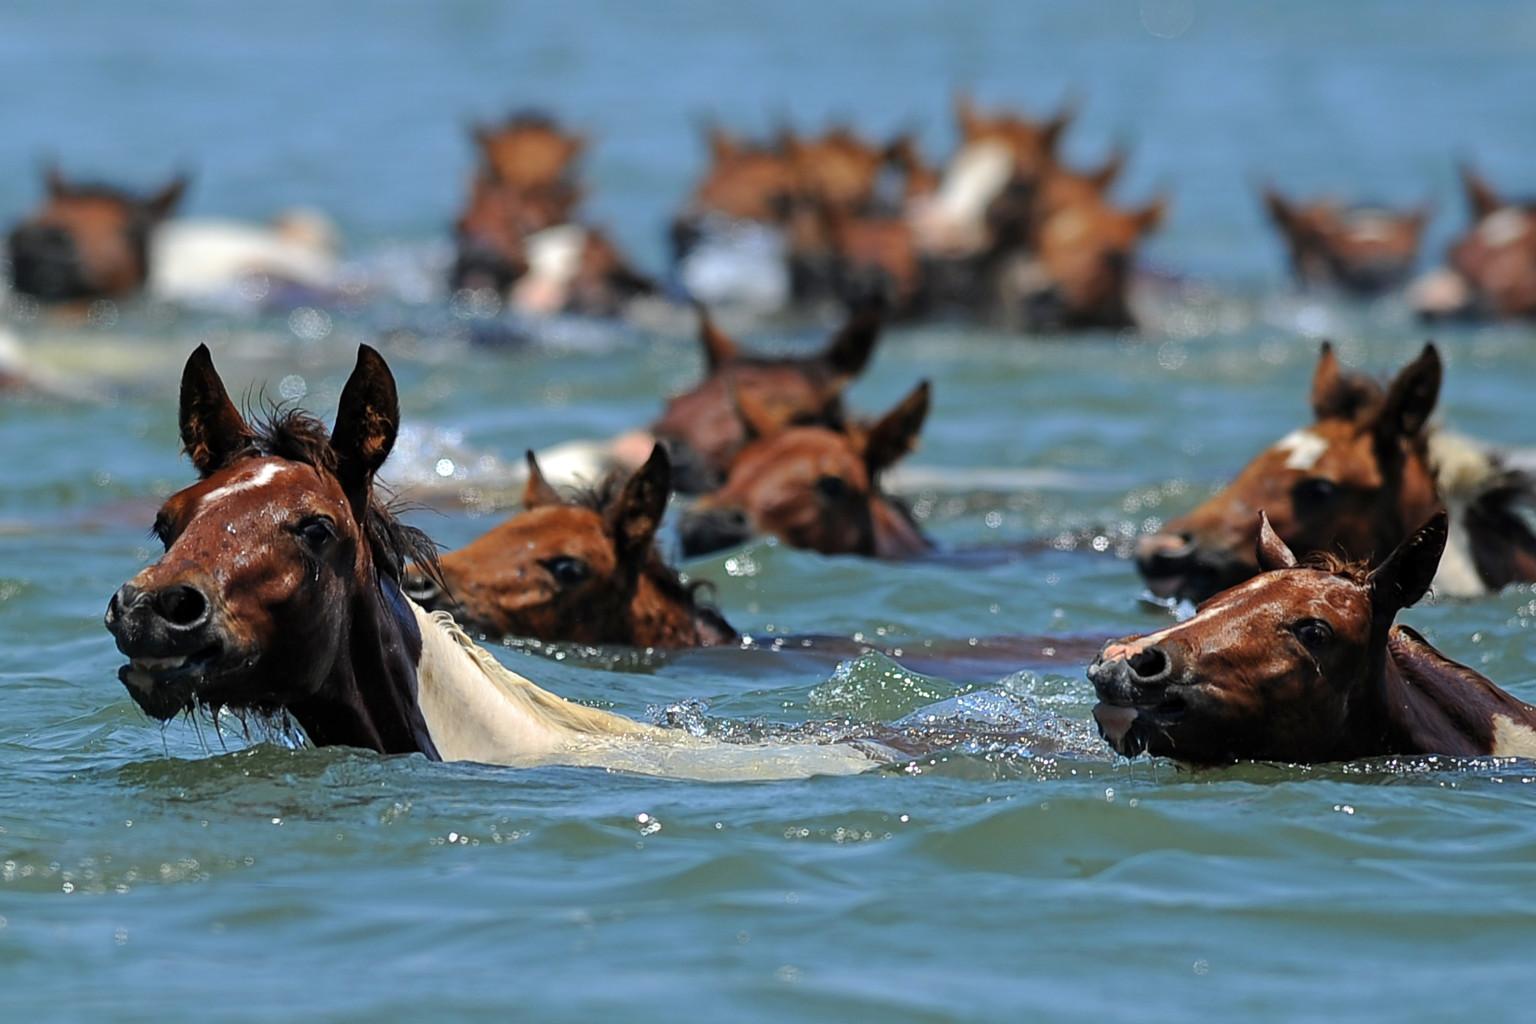 Chincoteague Pony Swim 2013: Assateague's Wild Horses ...